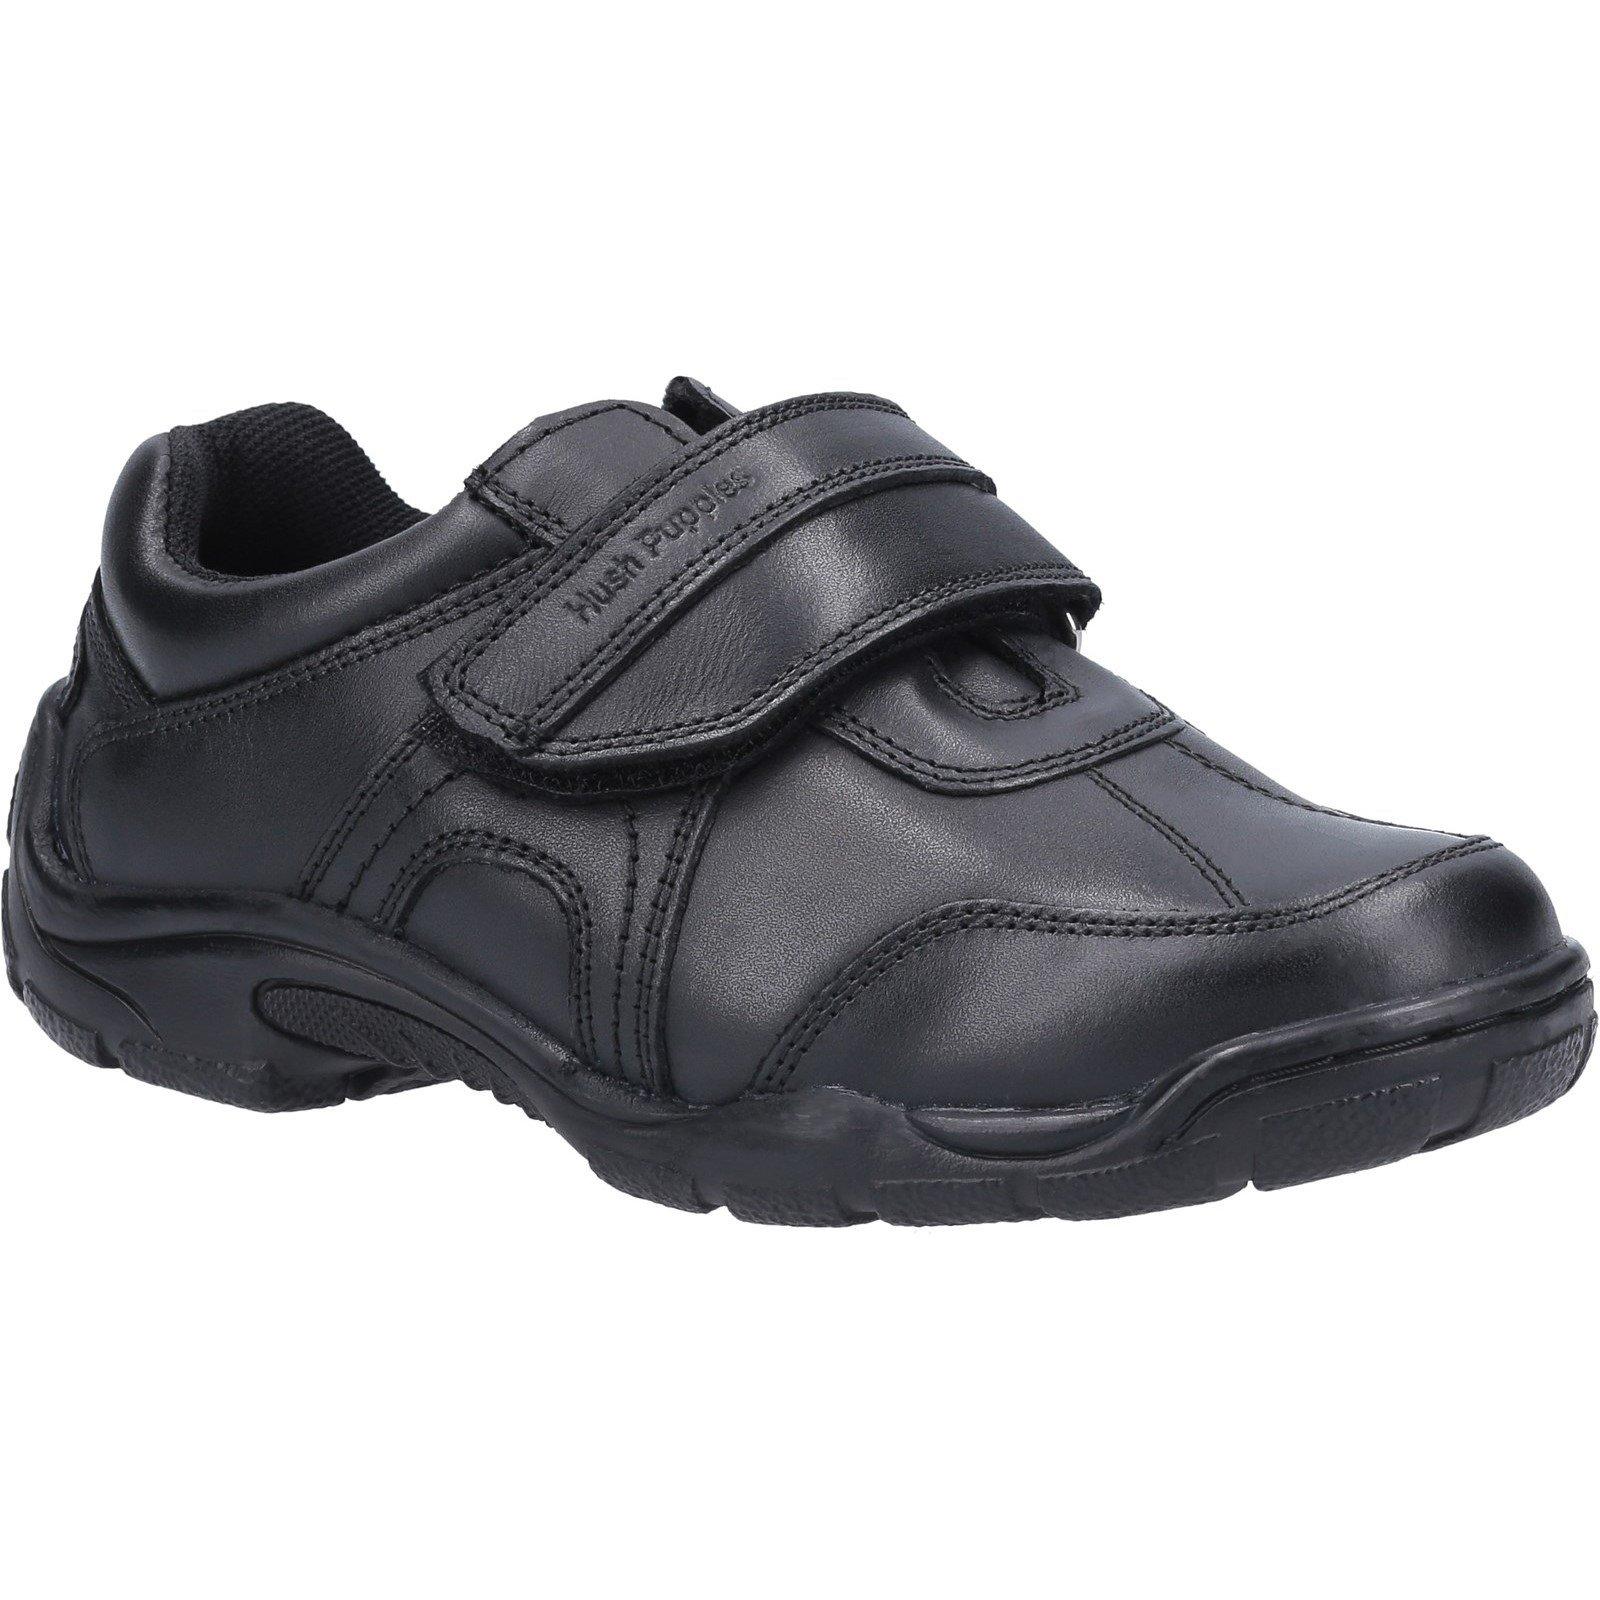 Hush Puppies Kid's Arlo Junior School Shoe Black 30853 - Black 2